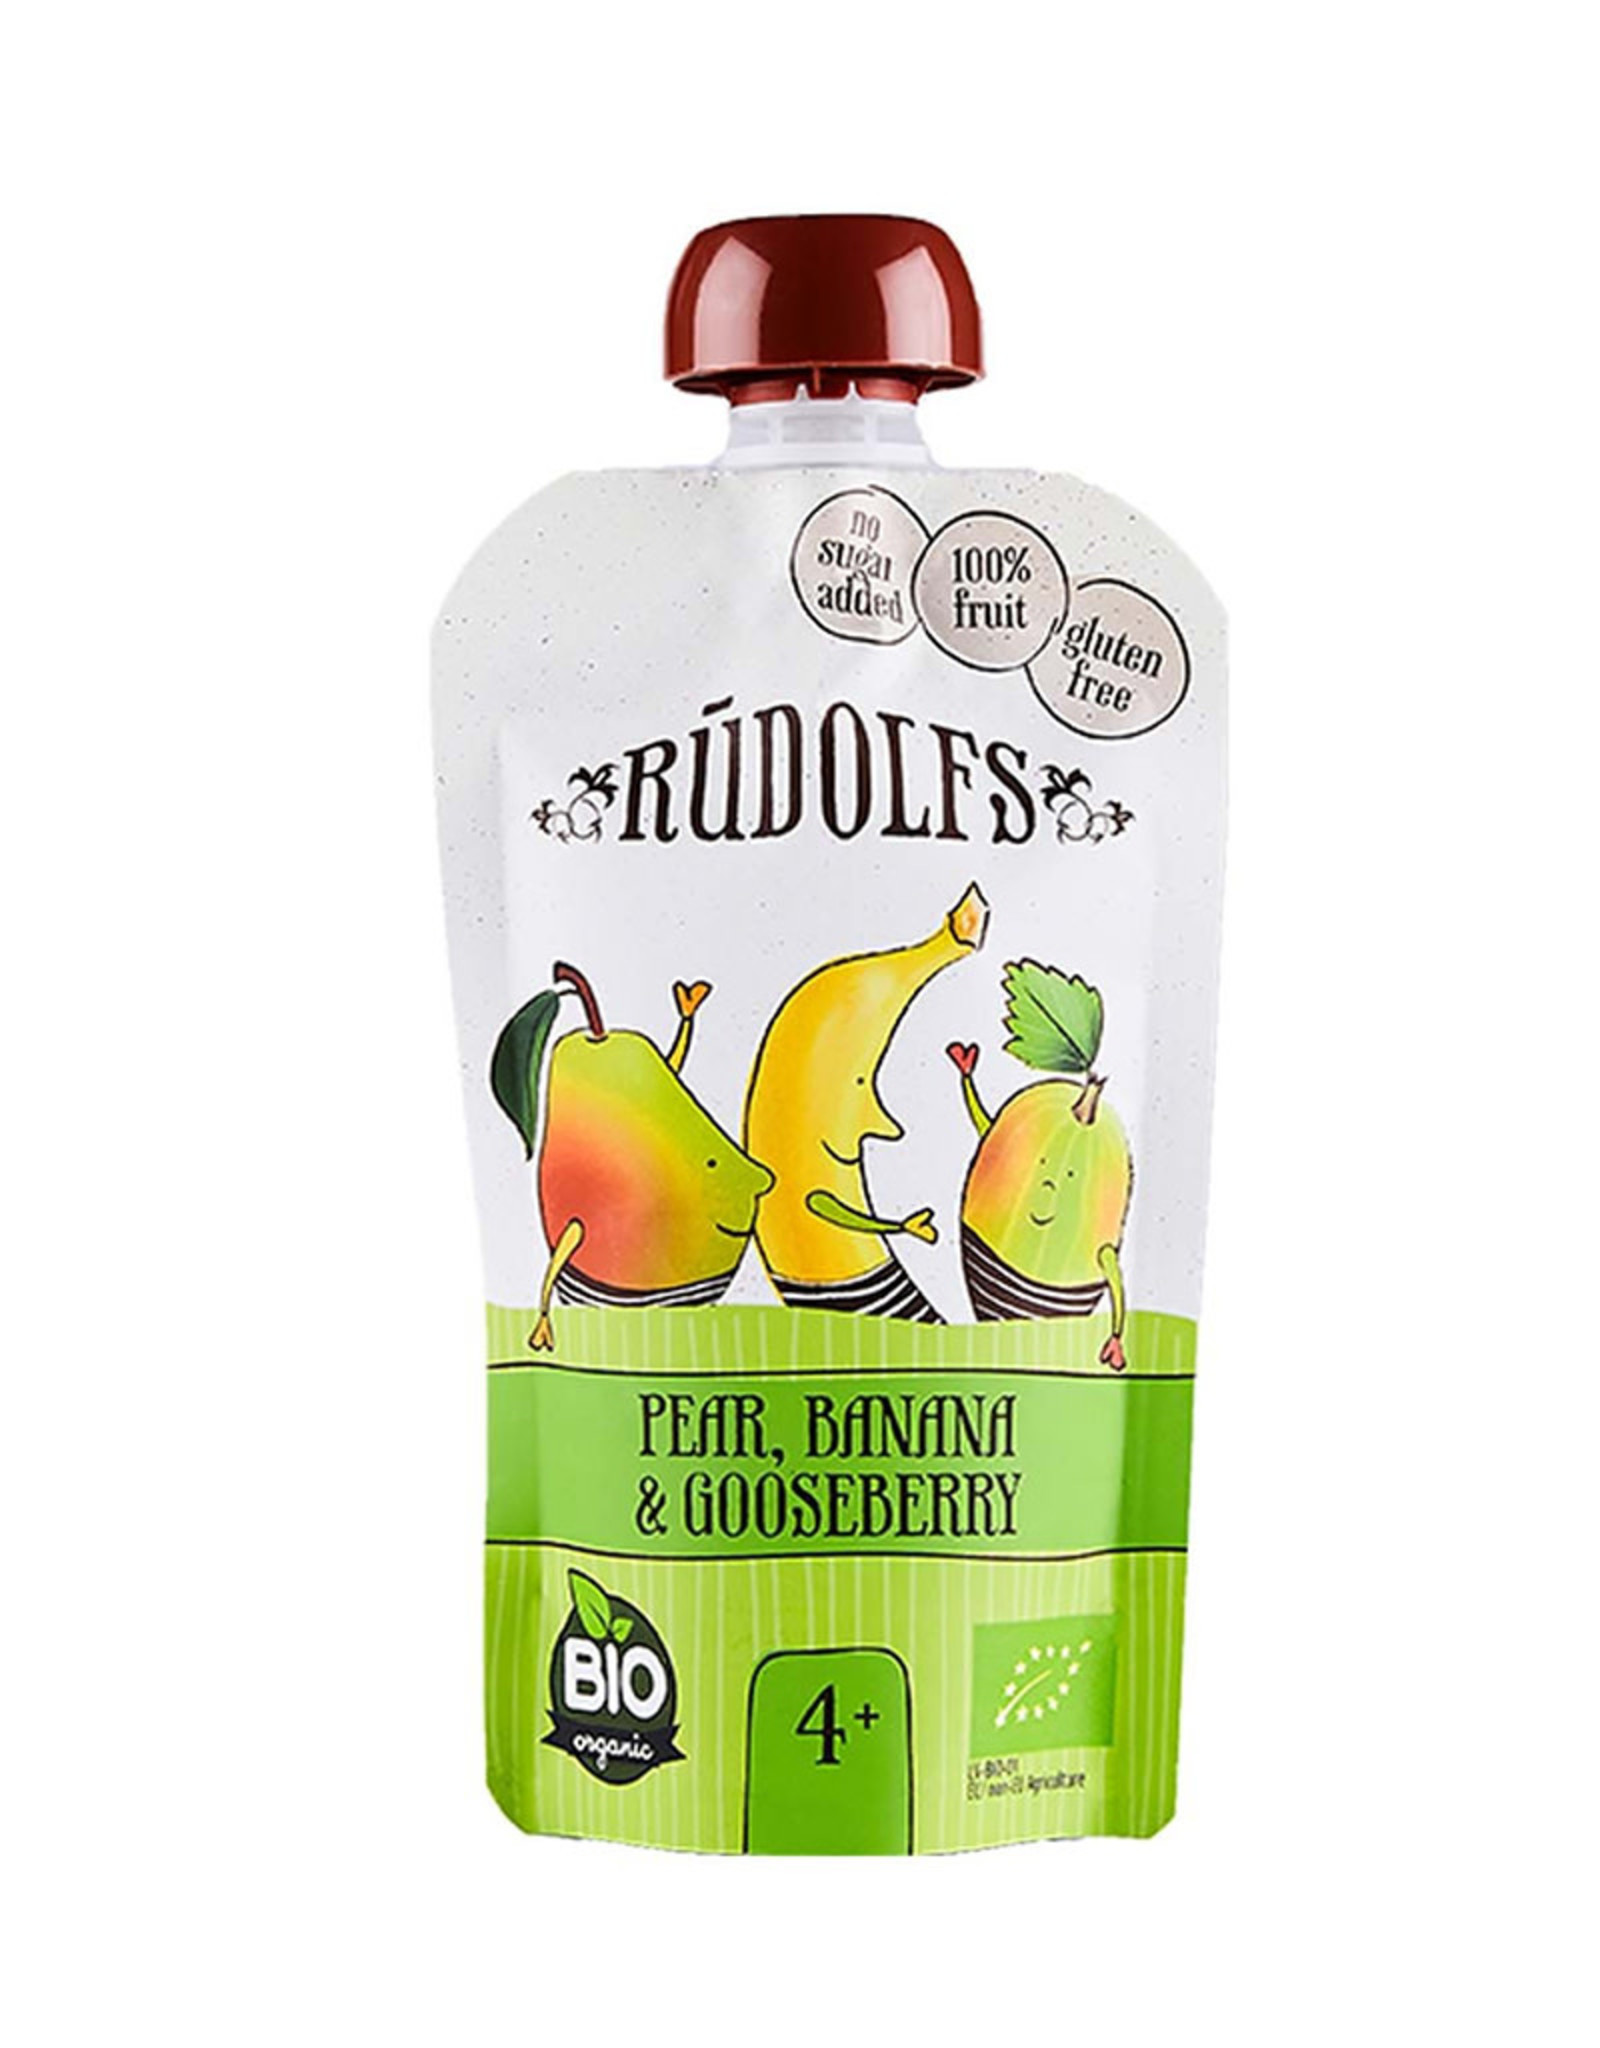 Rudolf's Bio Organics Rudolfs - Pear Banana Gooseberry Puree (110g)